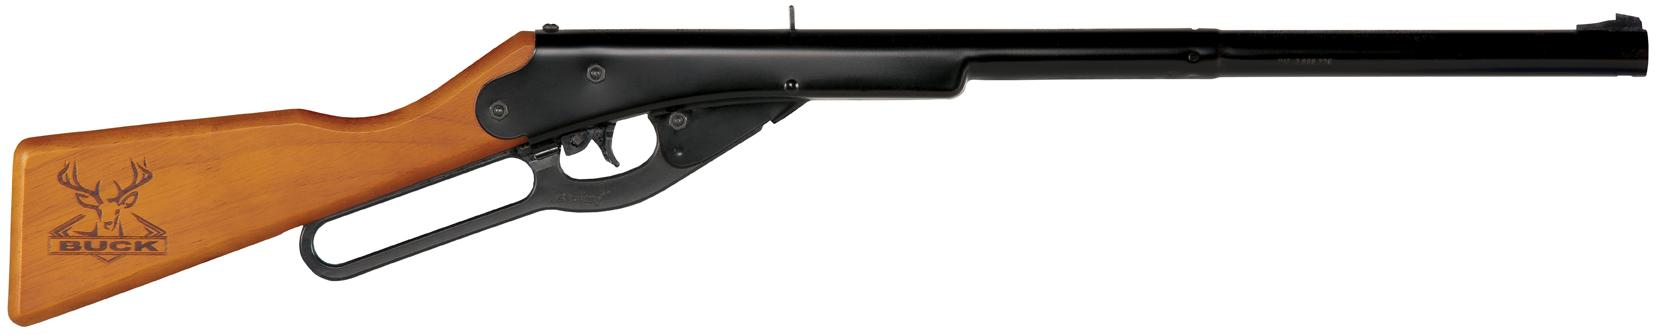 Daisy Youth Model 105 Buck Spring-Air BB Rifle Gun (Brown/Black, 29 8 Inch)